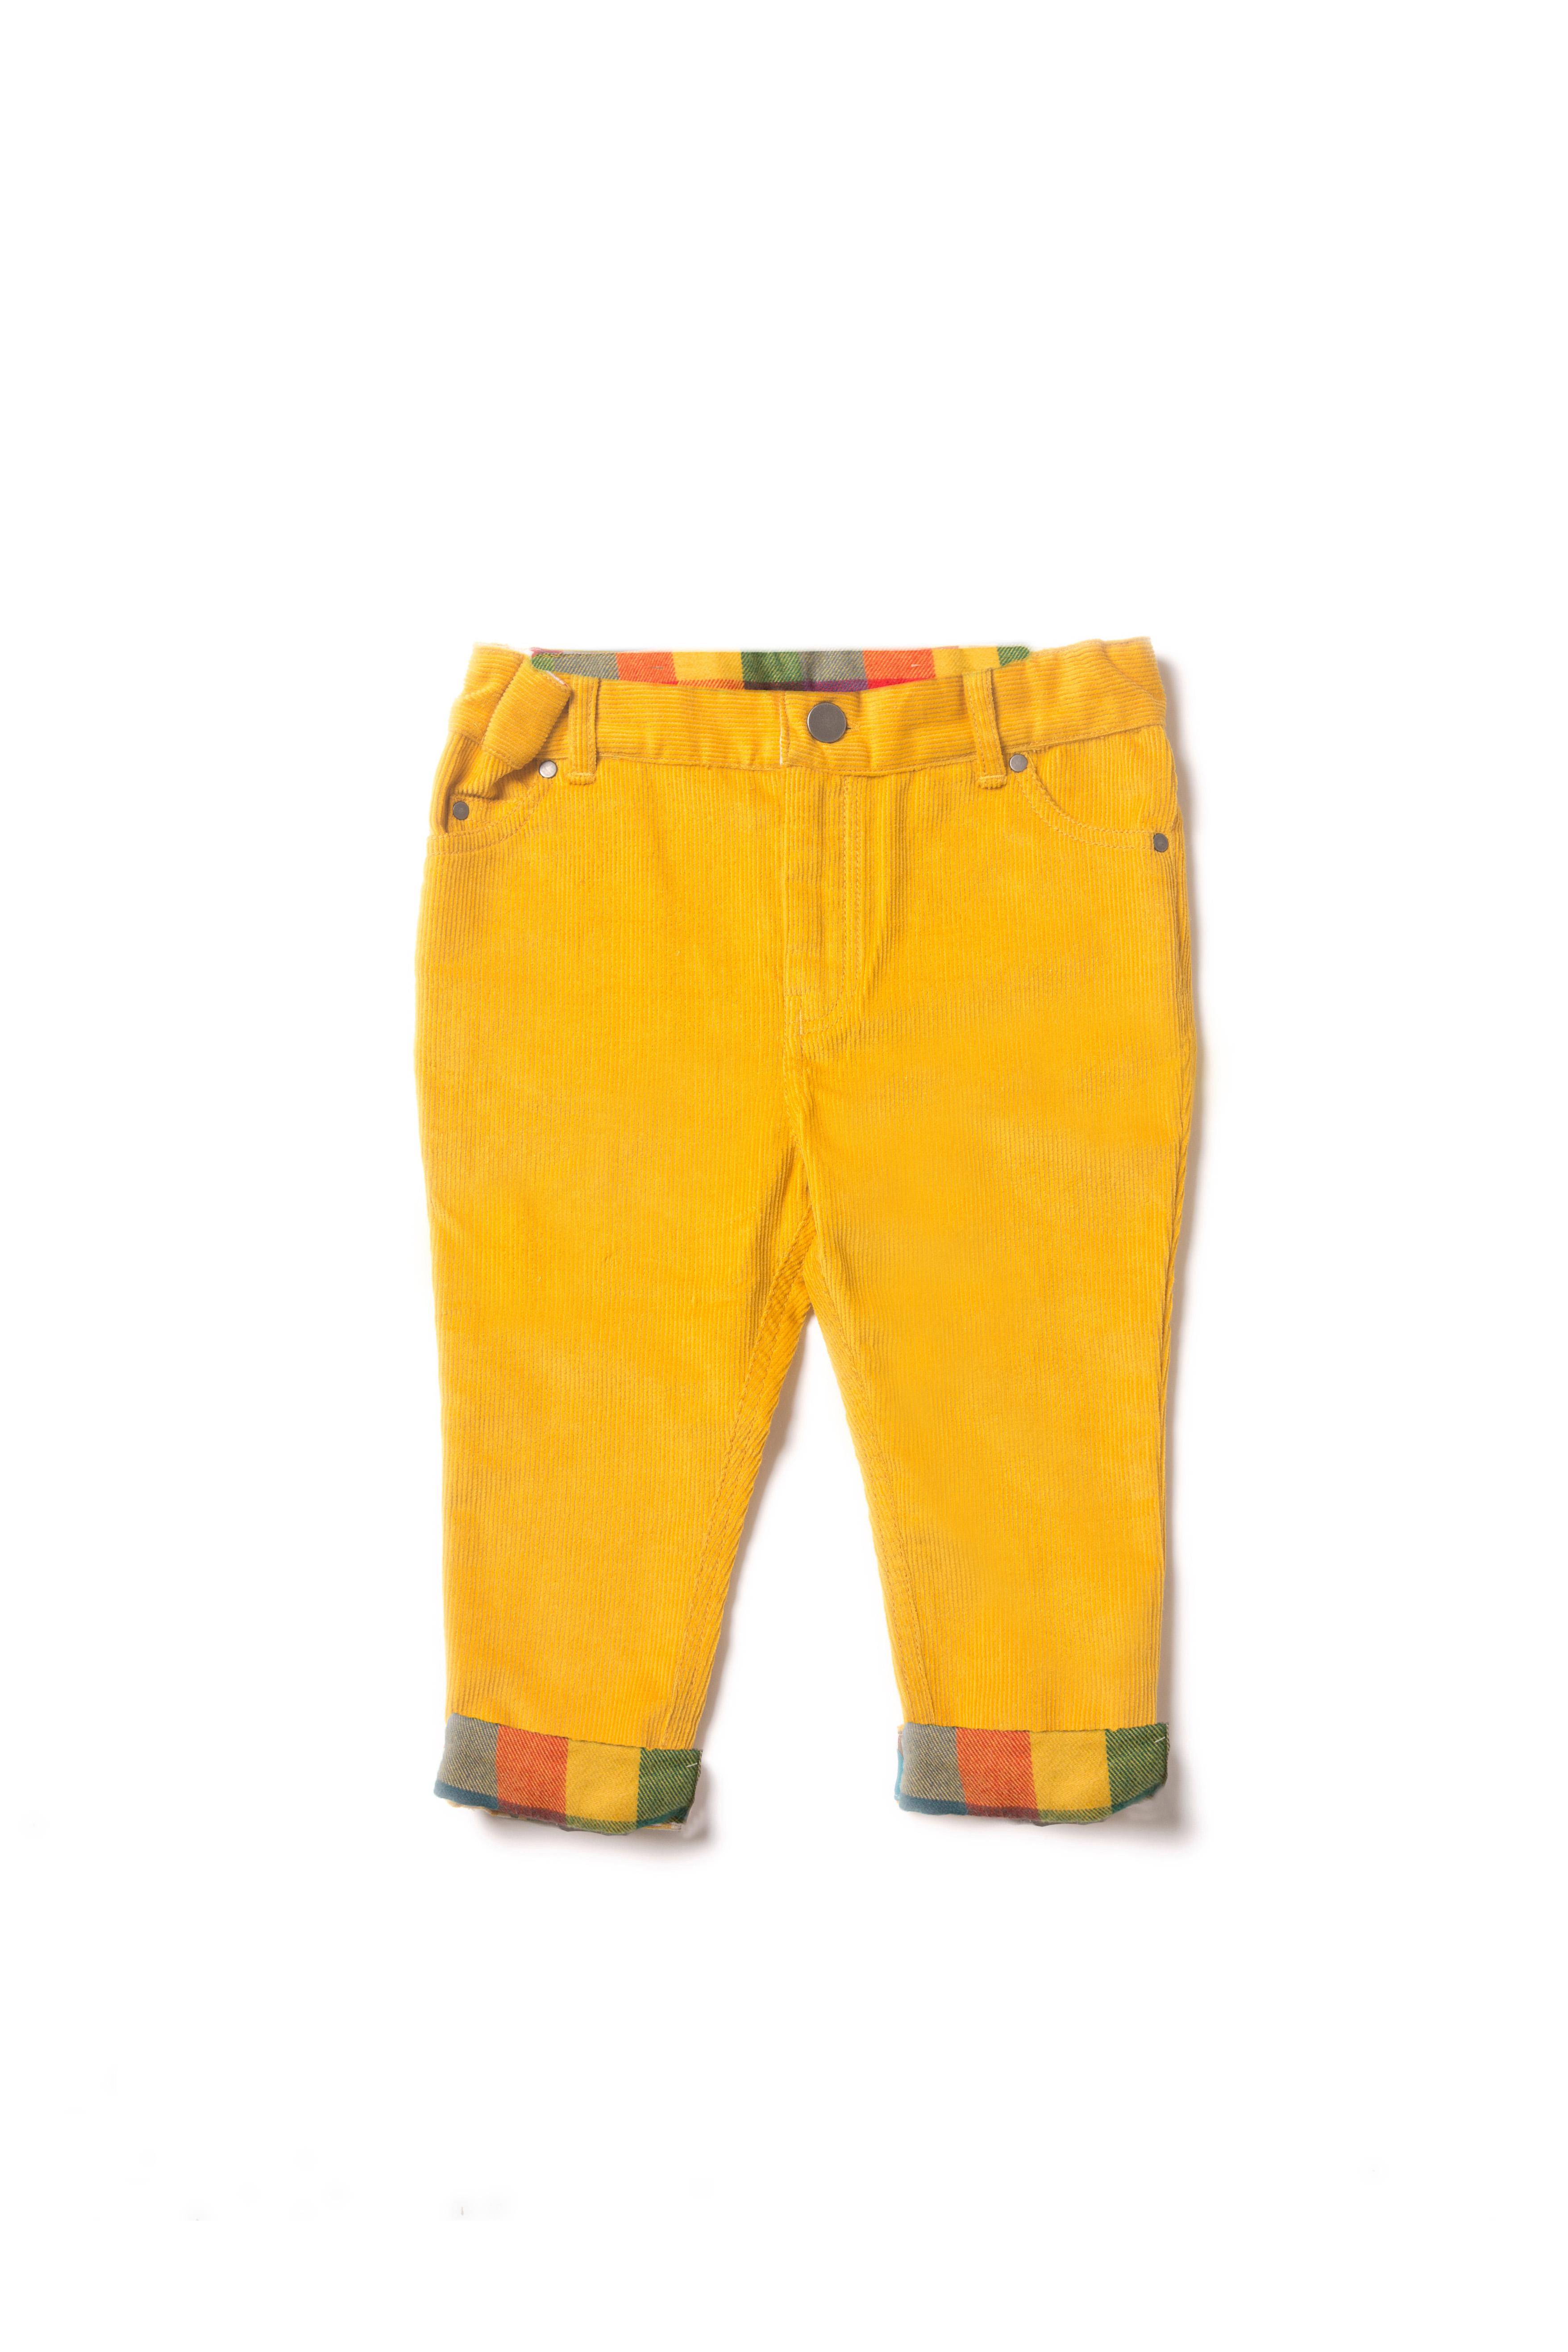 LGR - Gold classic jeans